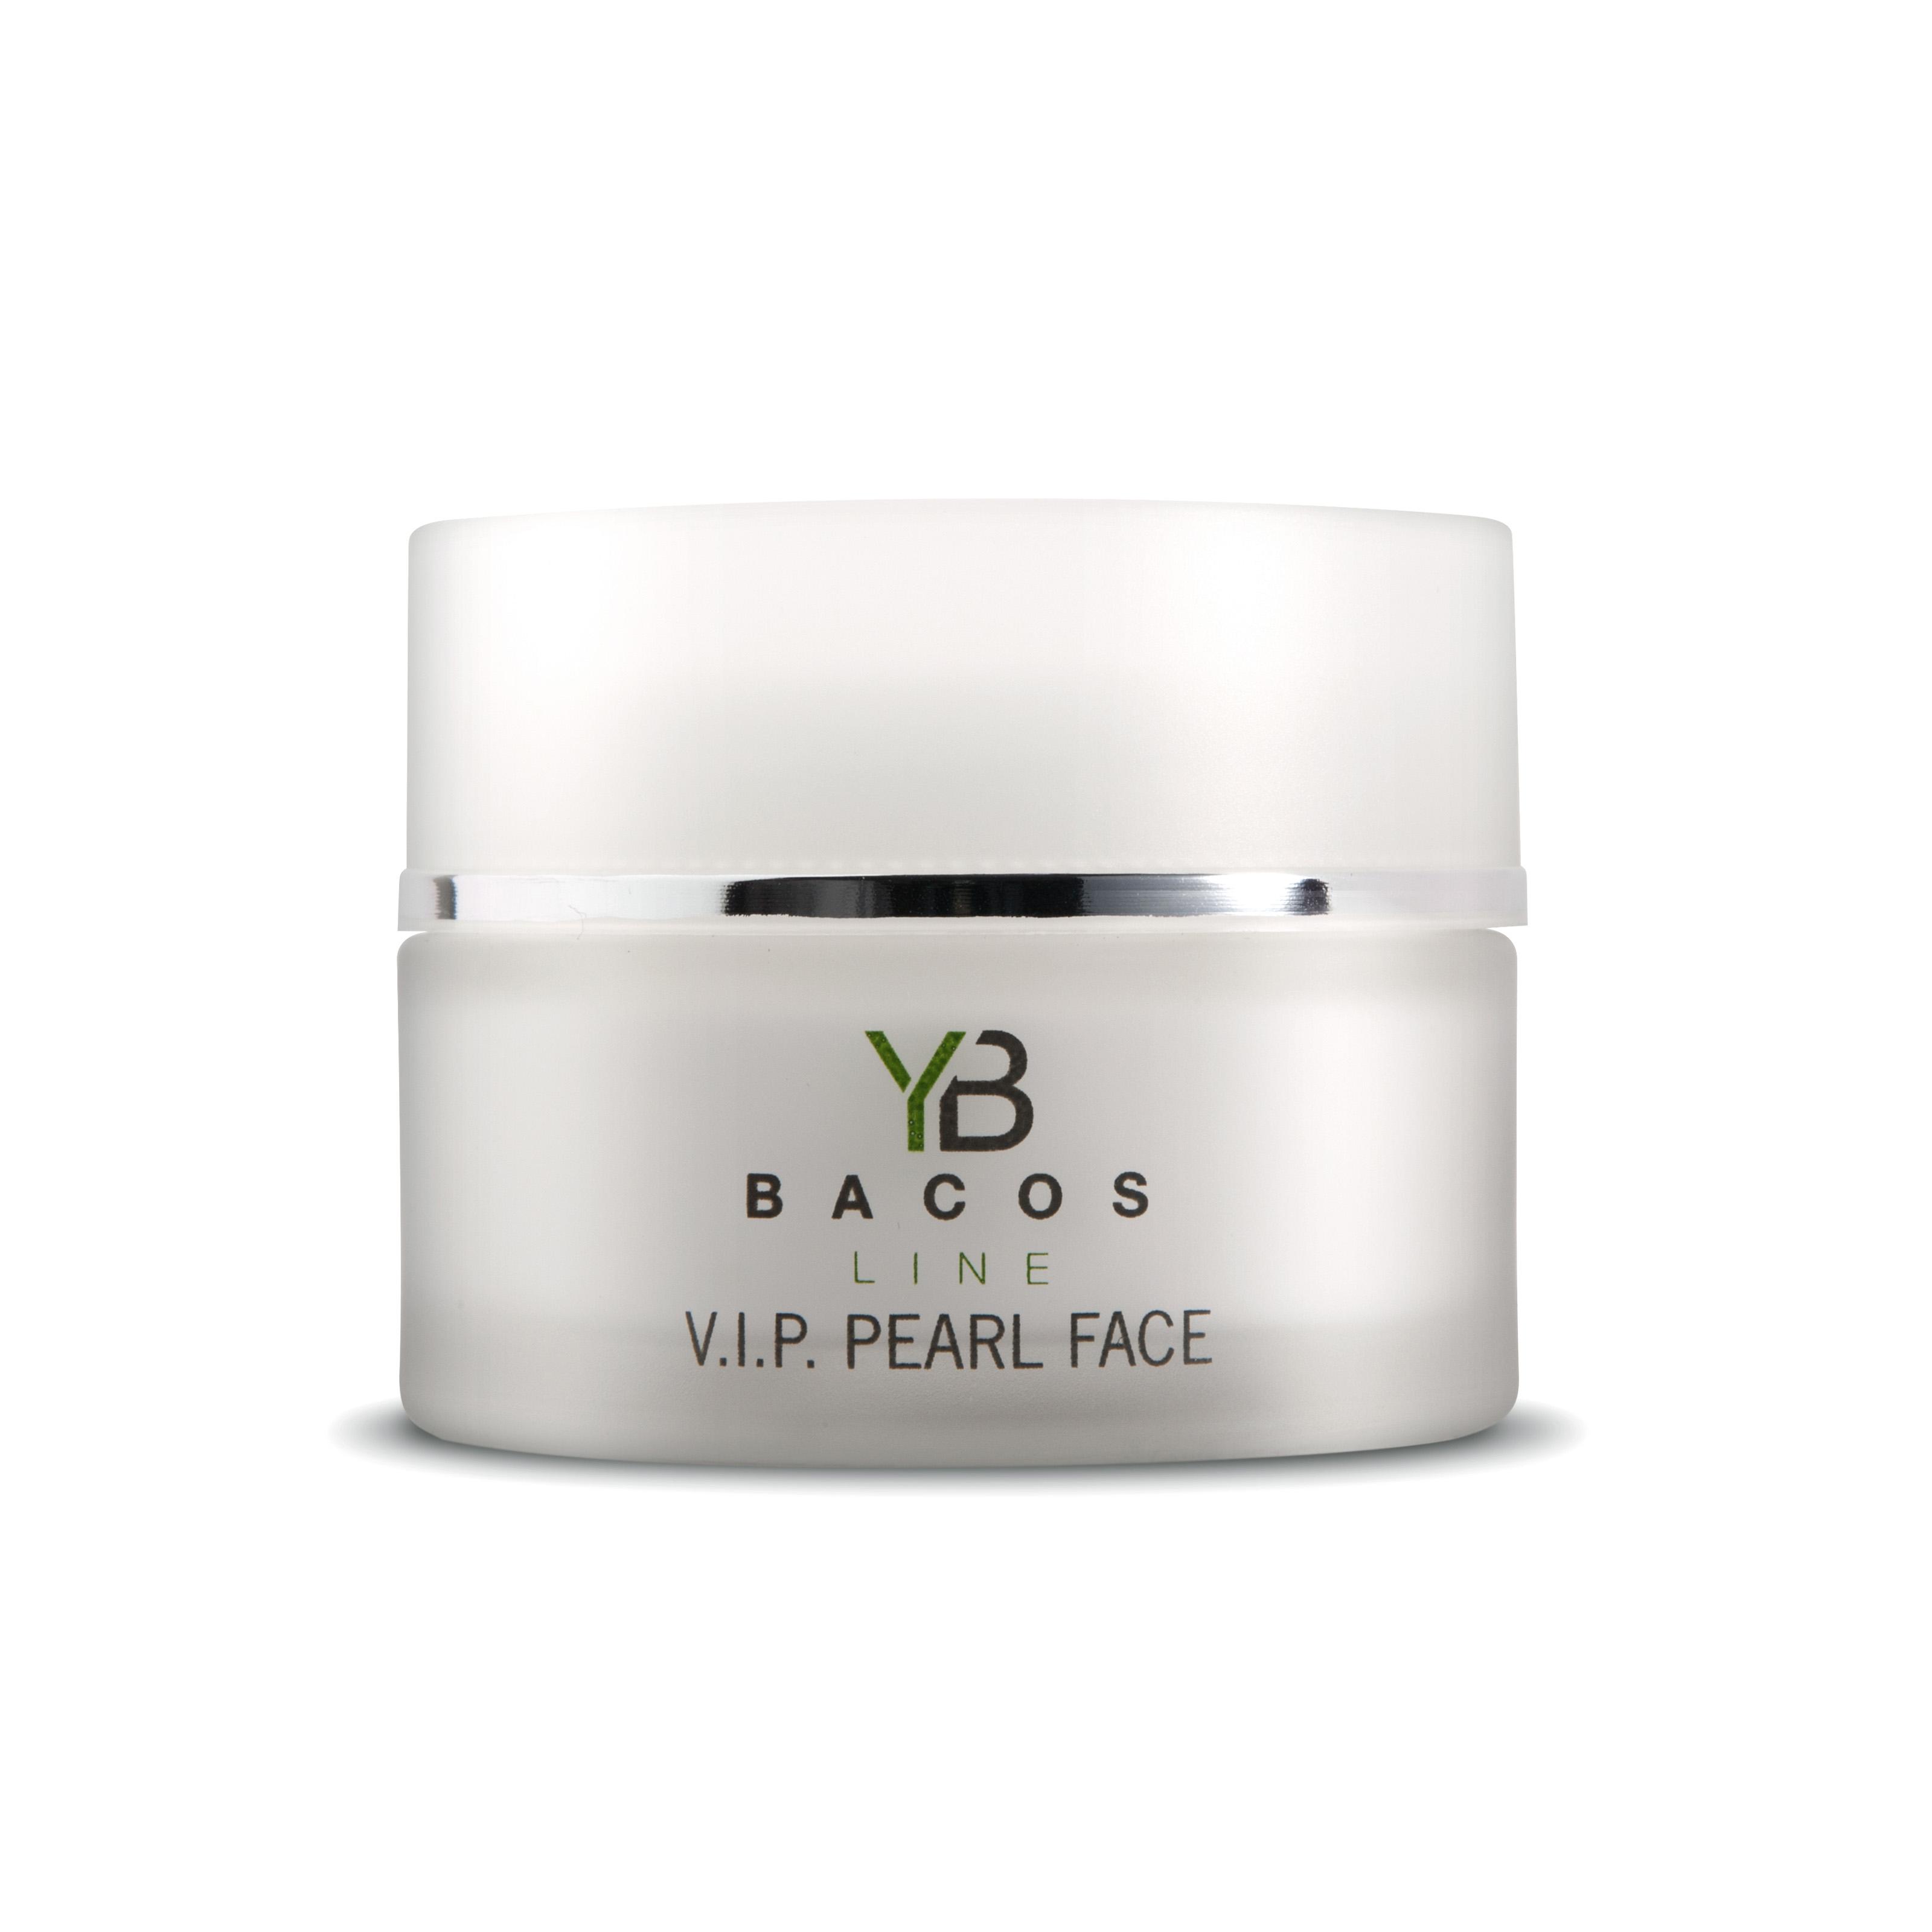 YB BACOS LINE V.I.P PEARL FACE CREAM 50 ml